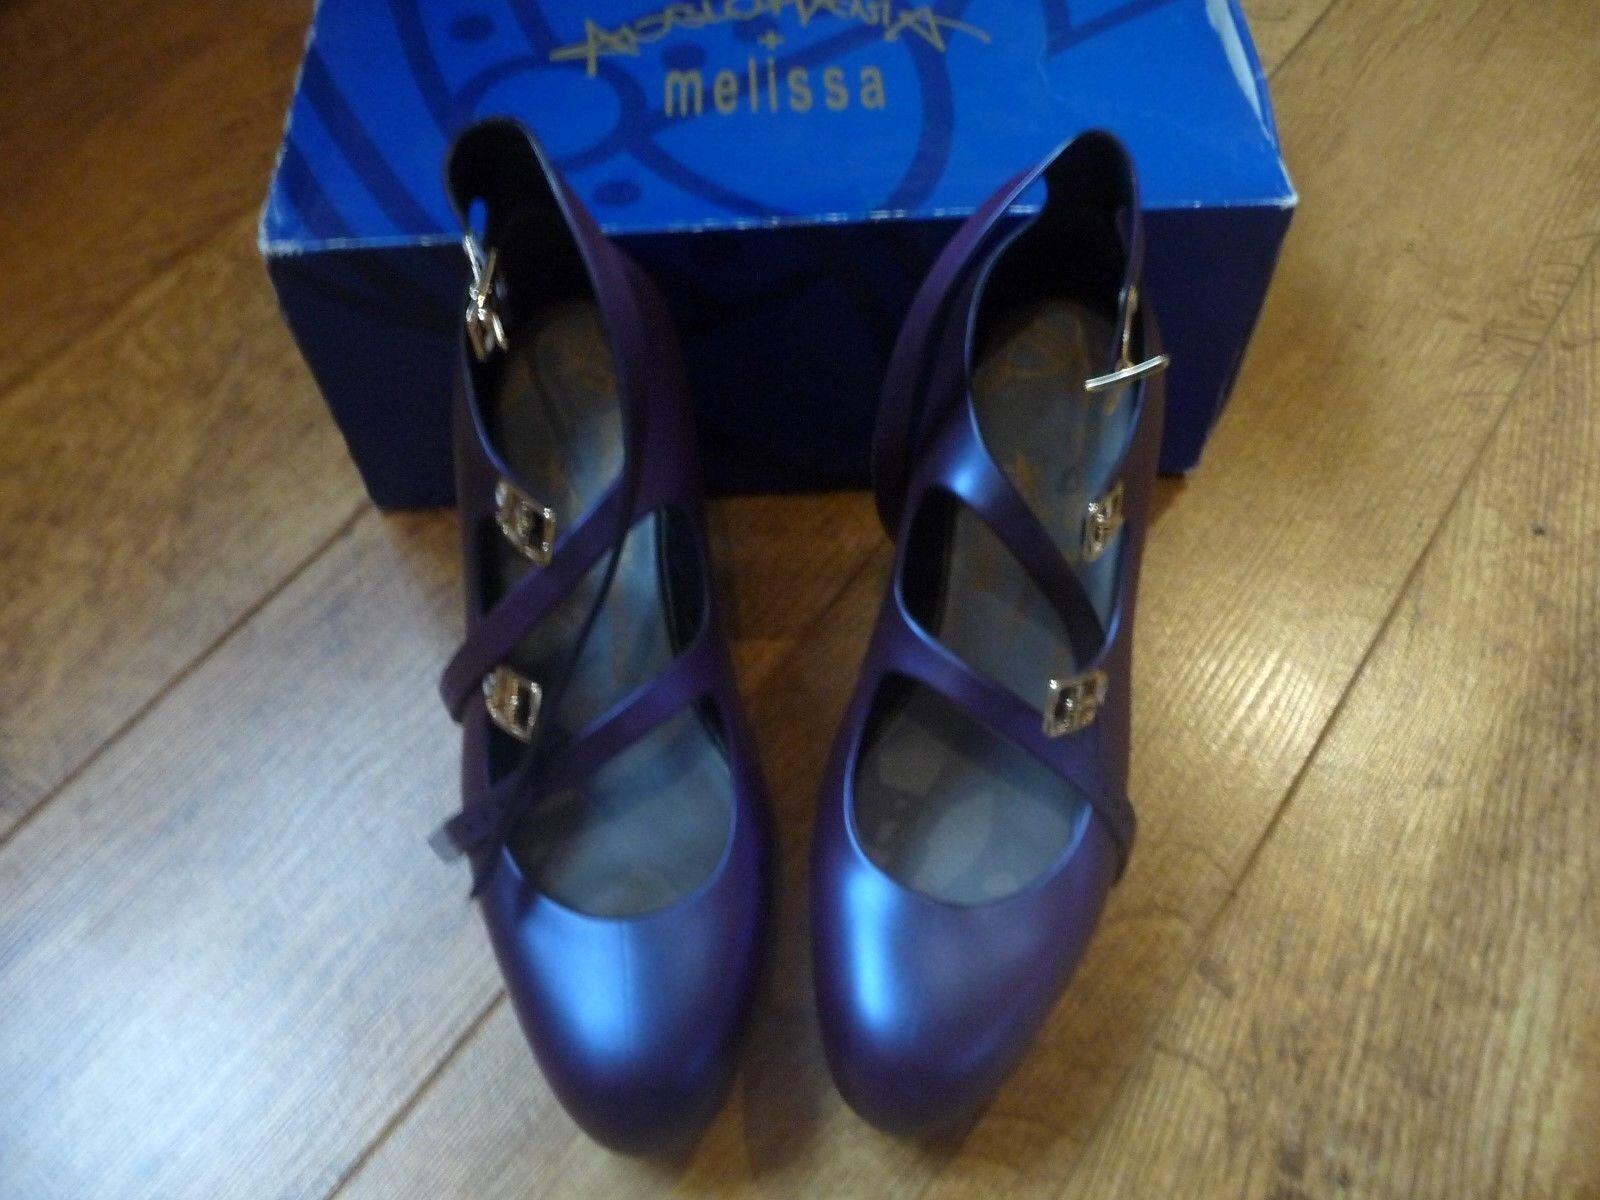 Damens's Vivienne Westwood 3 Melissa elevated 3 Westwood strap purple two tone schuhe UK 5 / 5a1eaa